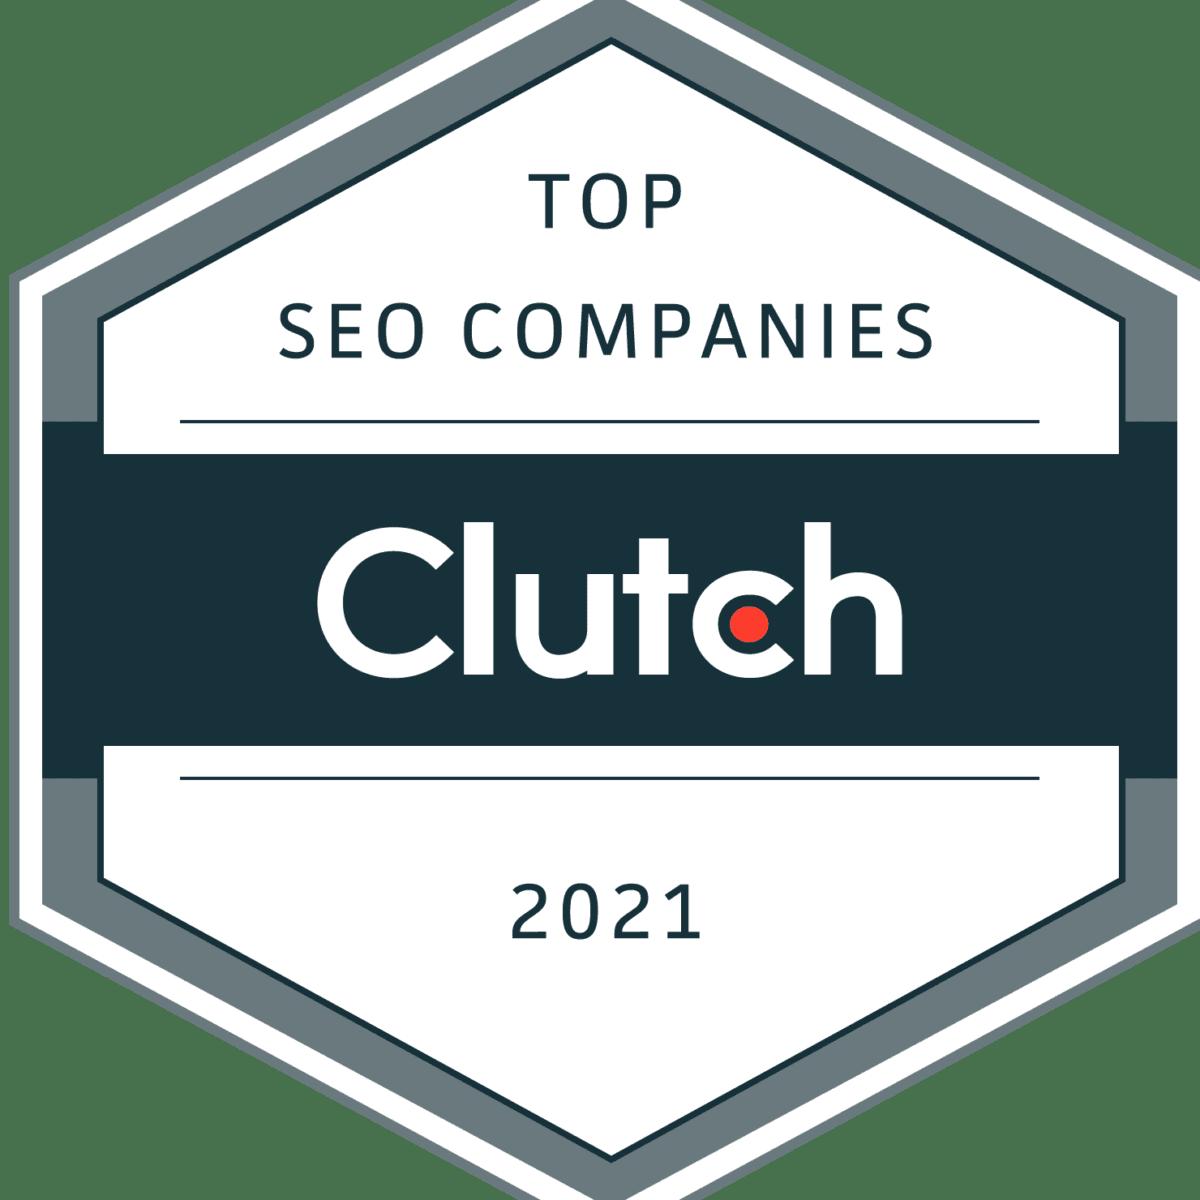 Clutch 2021 Best SEO Company Award